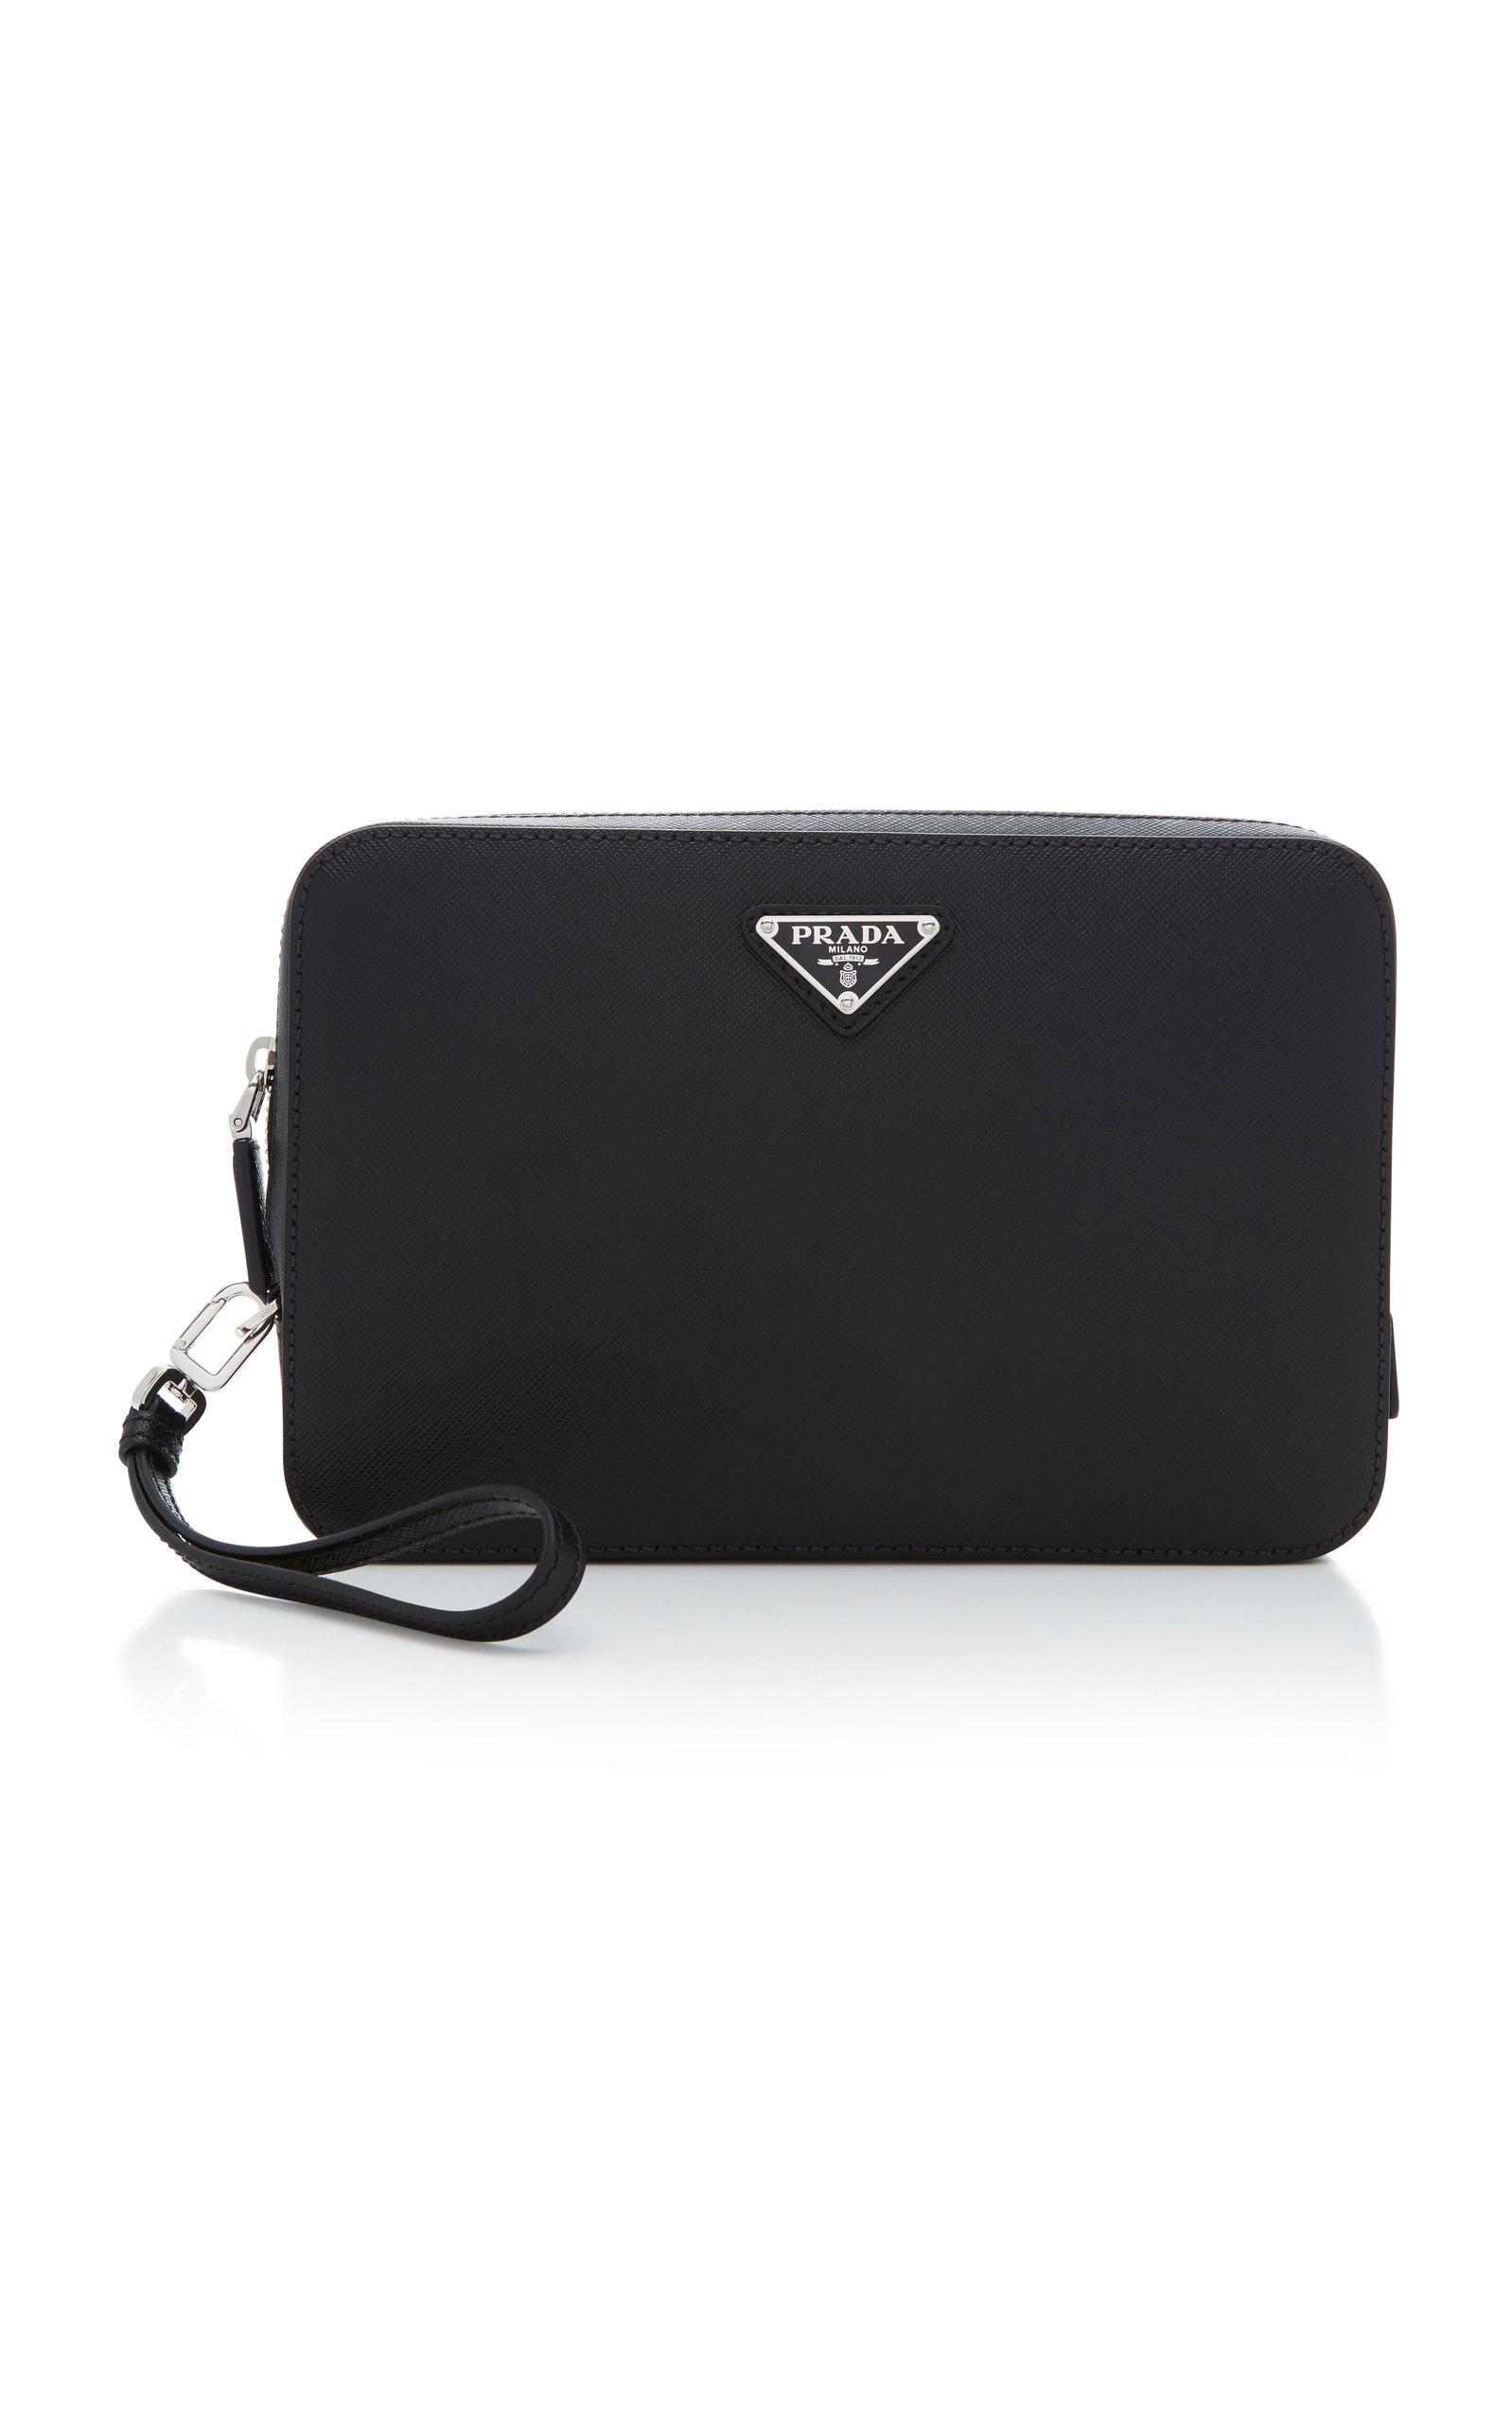 ca28ab4d05d Saffiano Leather Pouch by Prada | Moda Operandi